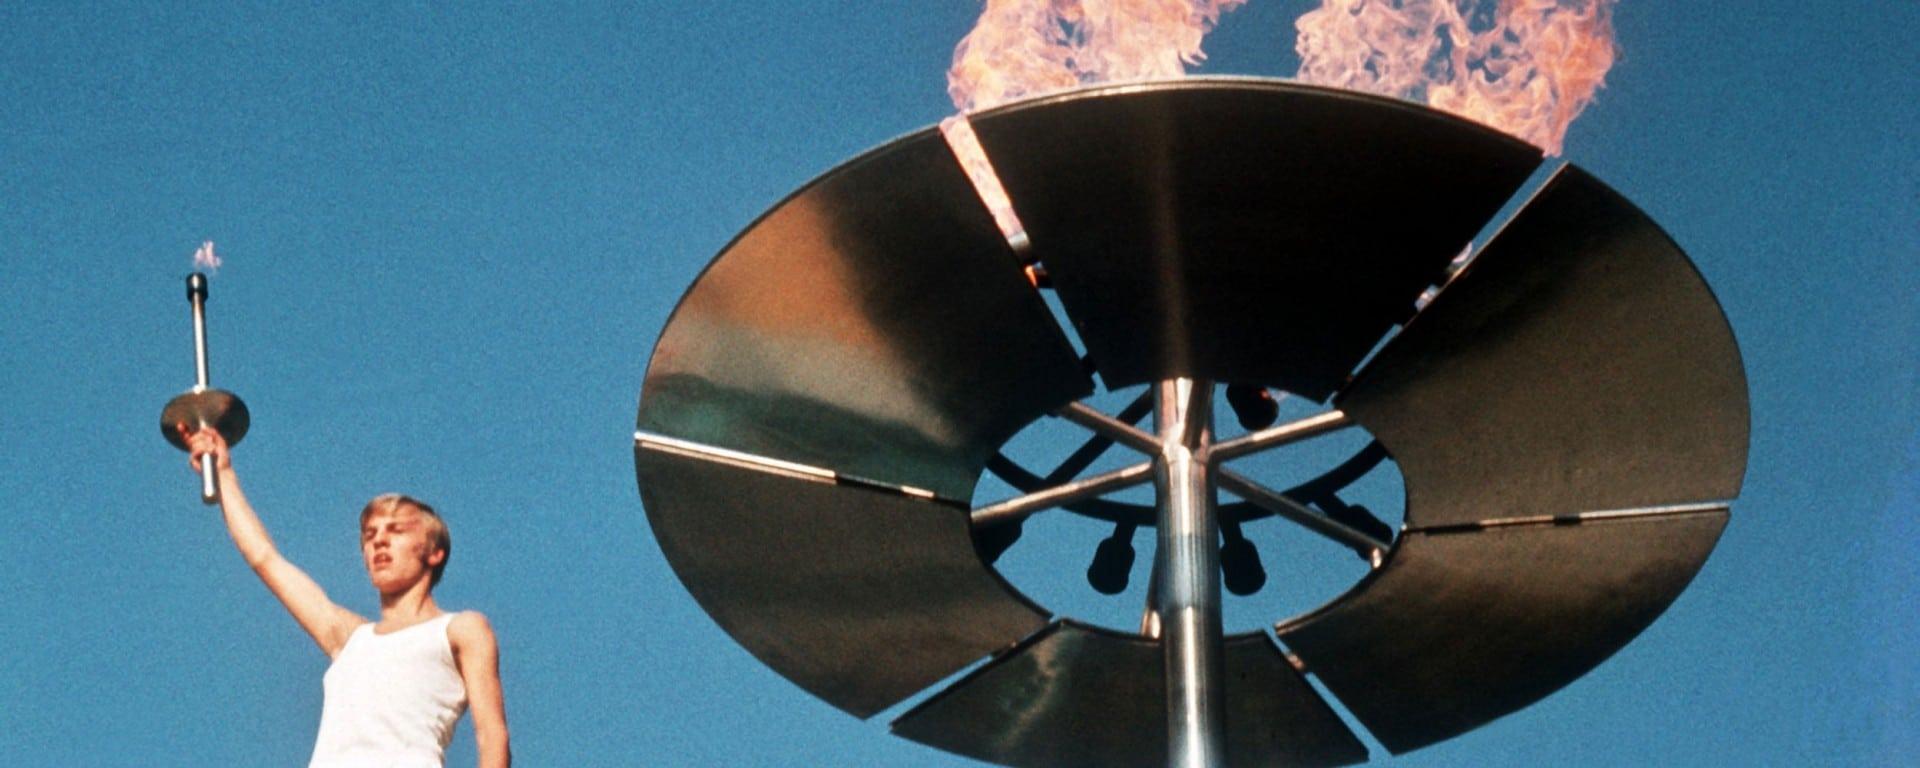 formteile metall tiefziehen blechumformung tiefziehteile metalldrückerei tiefziehen blech